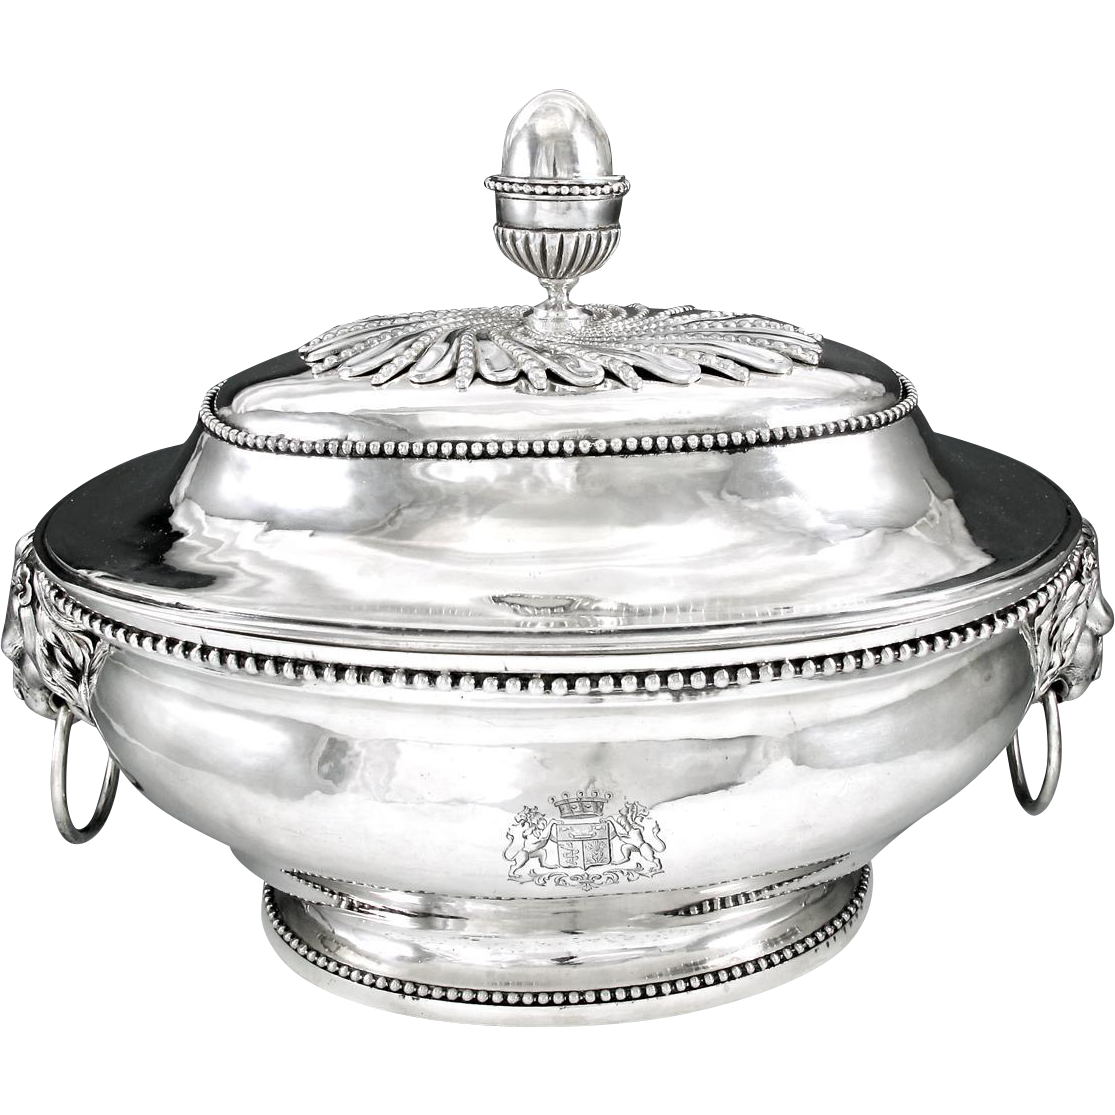 Soup clipart soup tureen. Spetacular antique th century